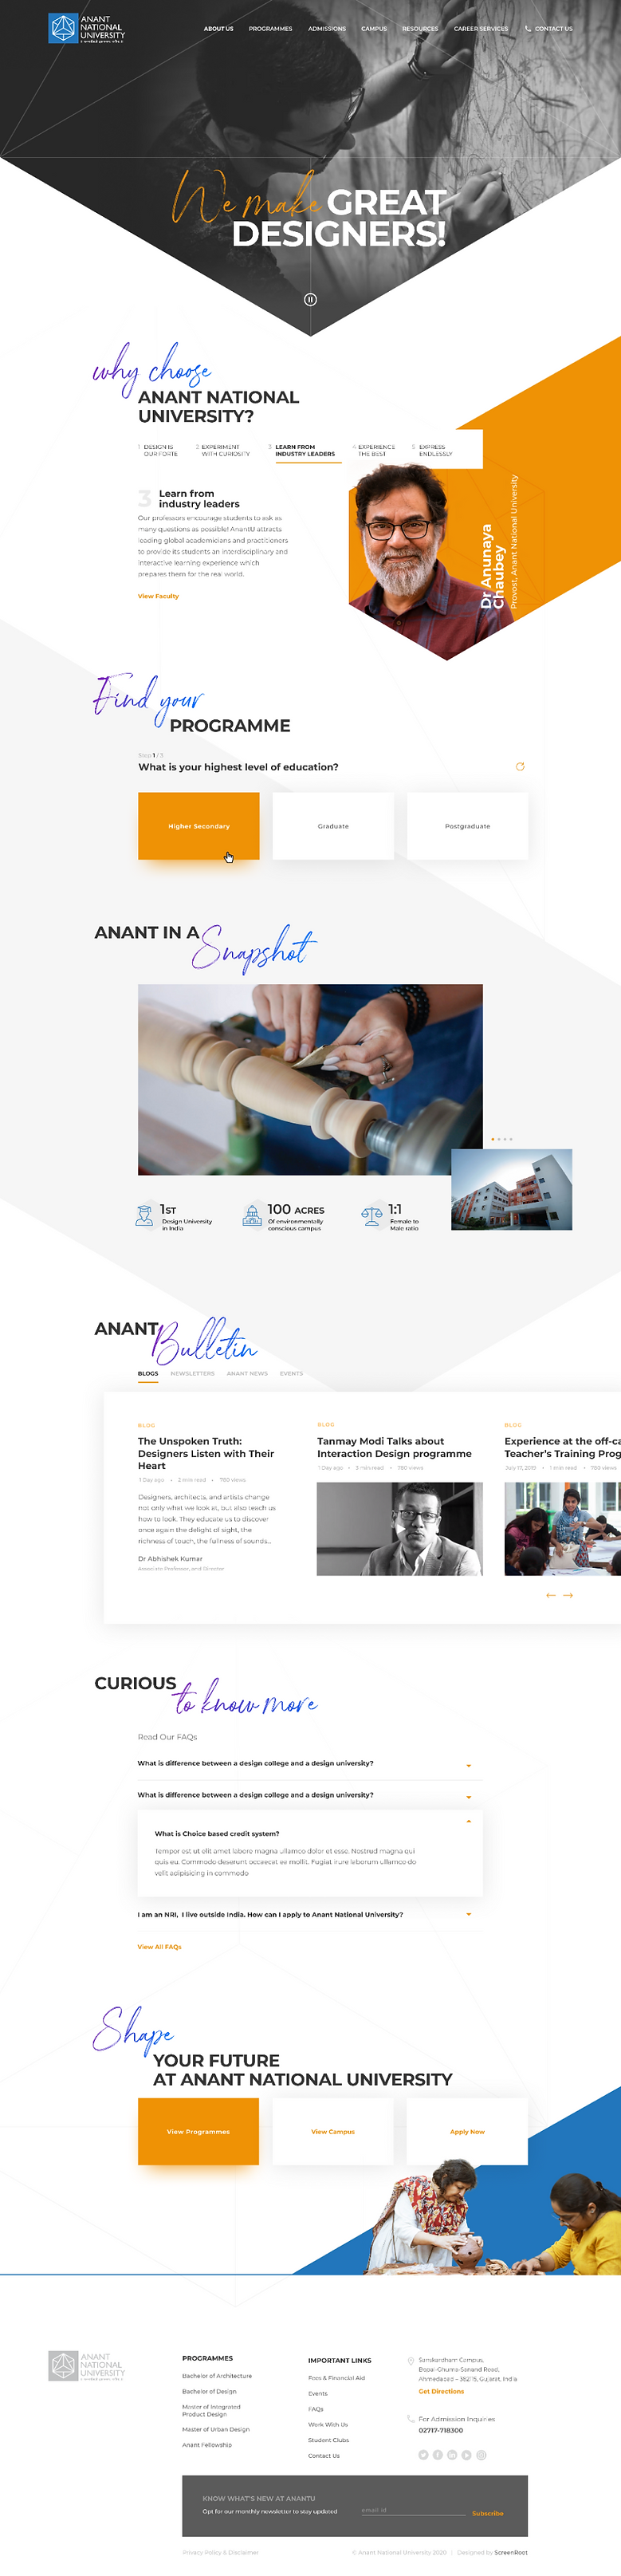 ANU Homepage 1.png